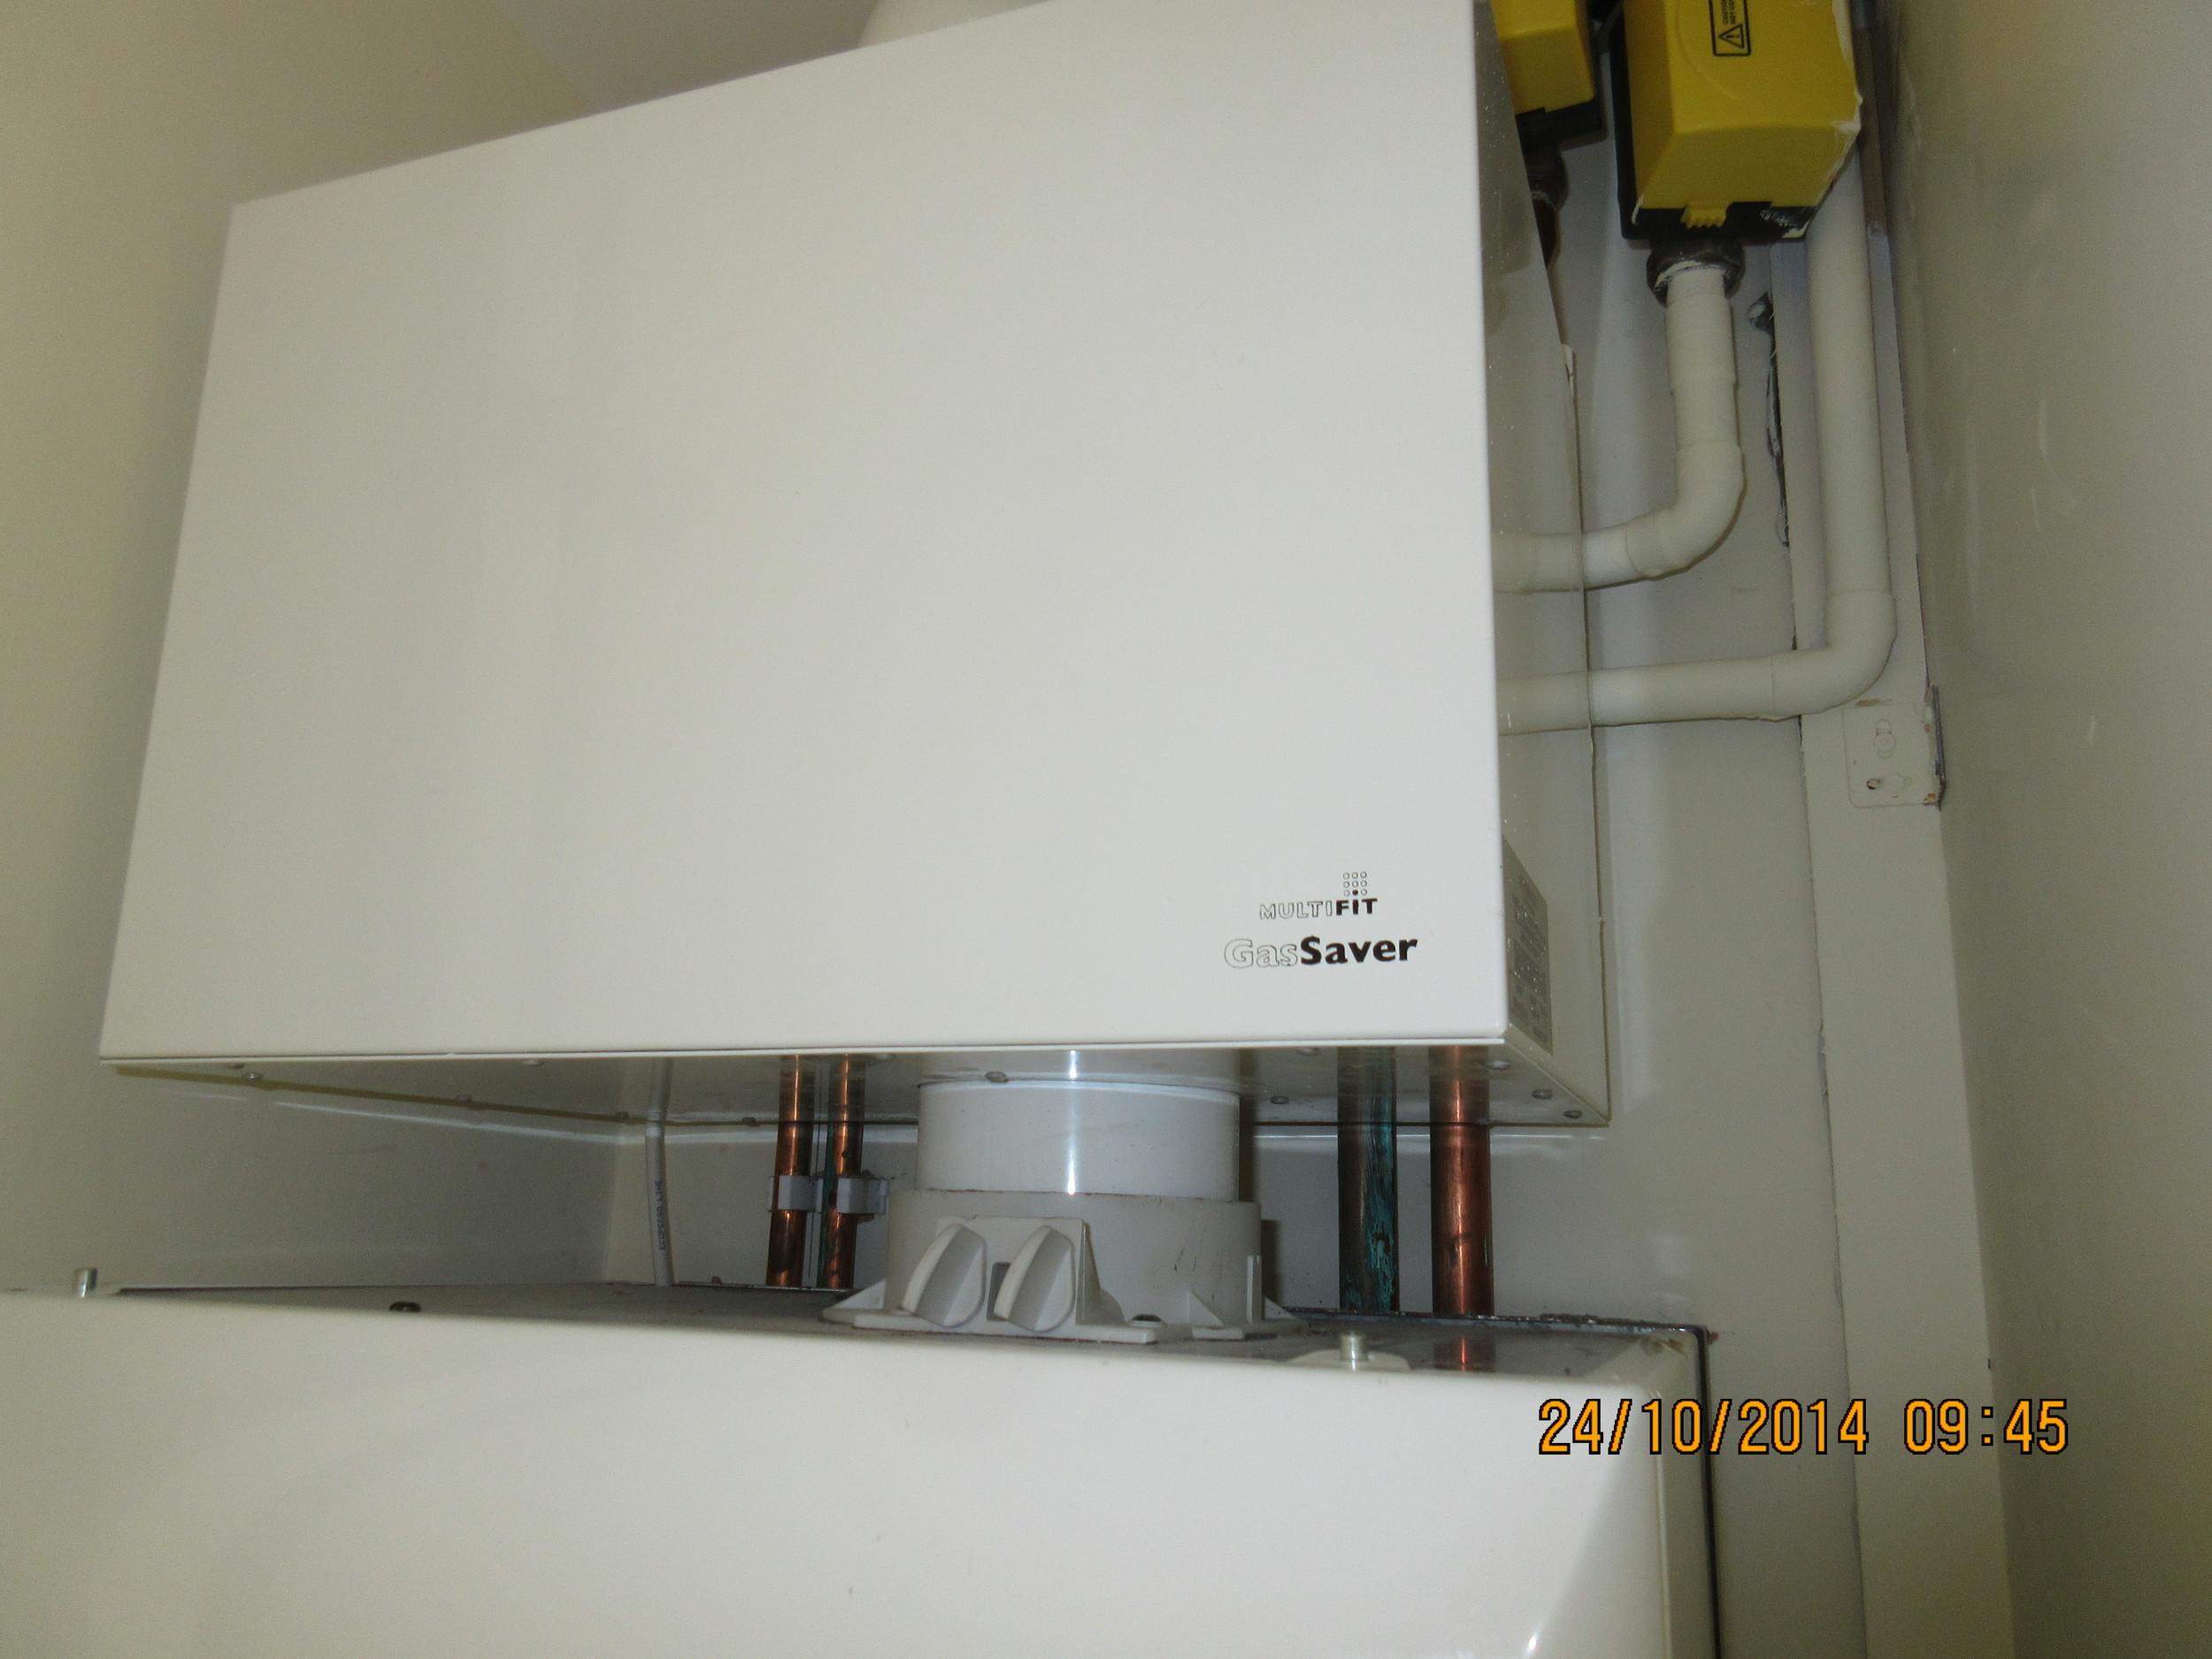 Zenex Gas Saver.JPG